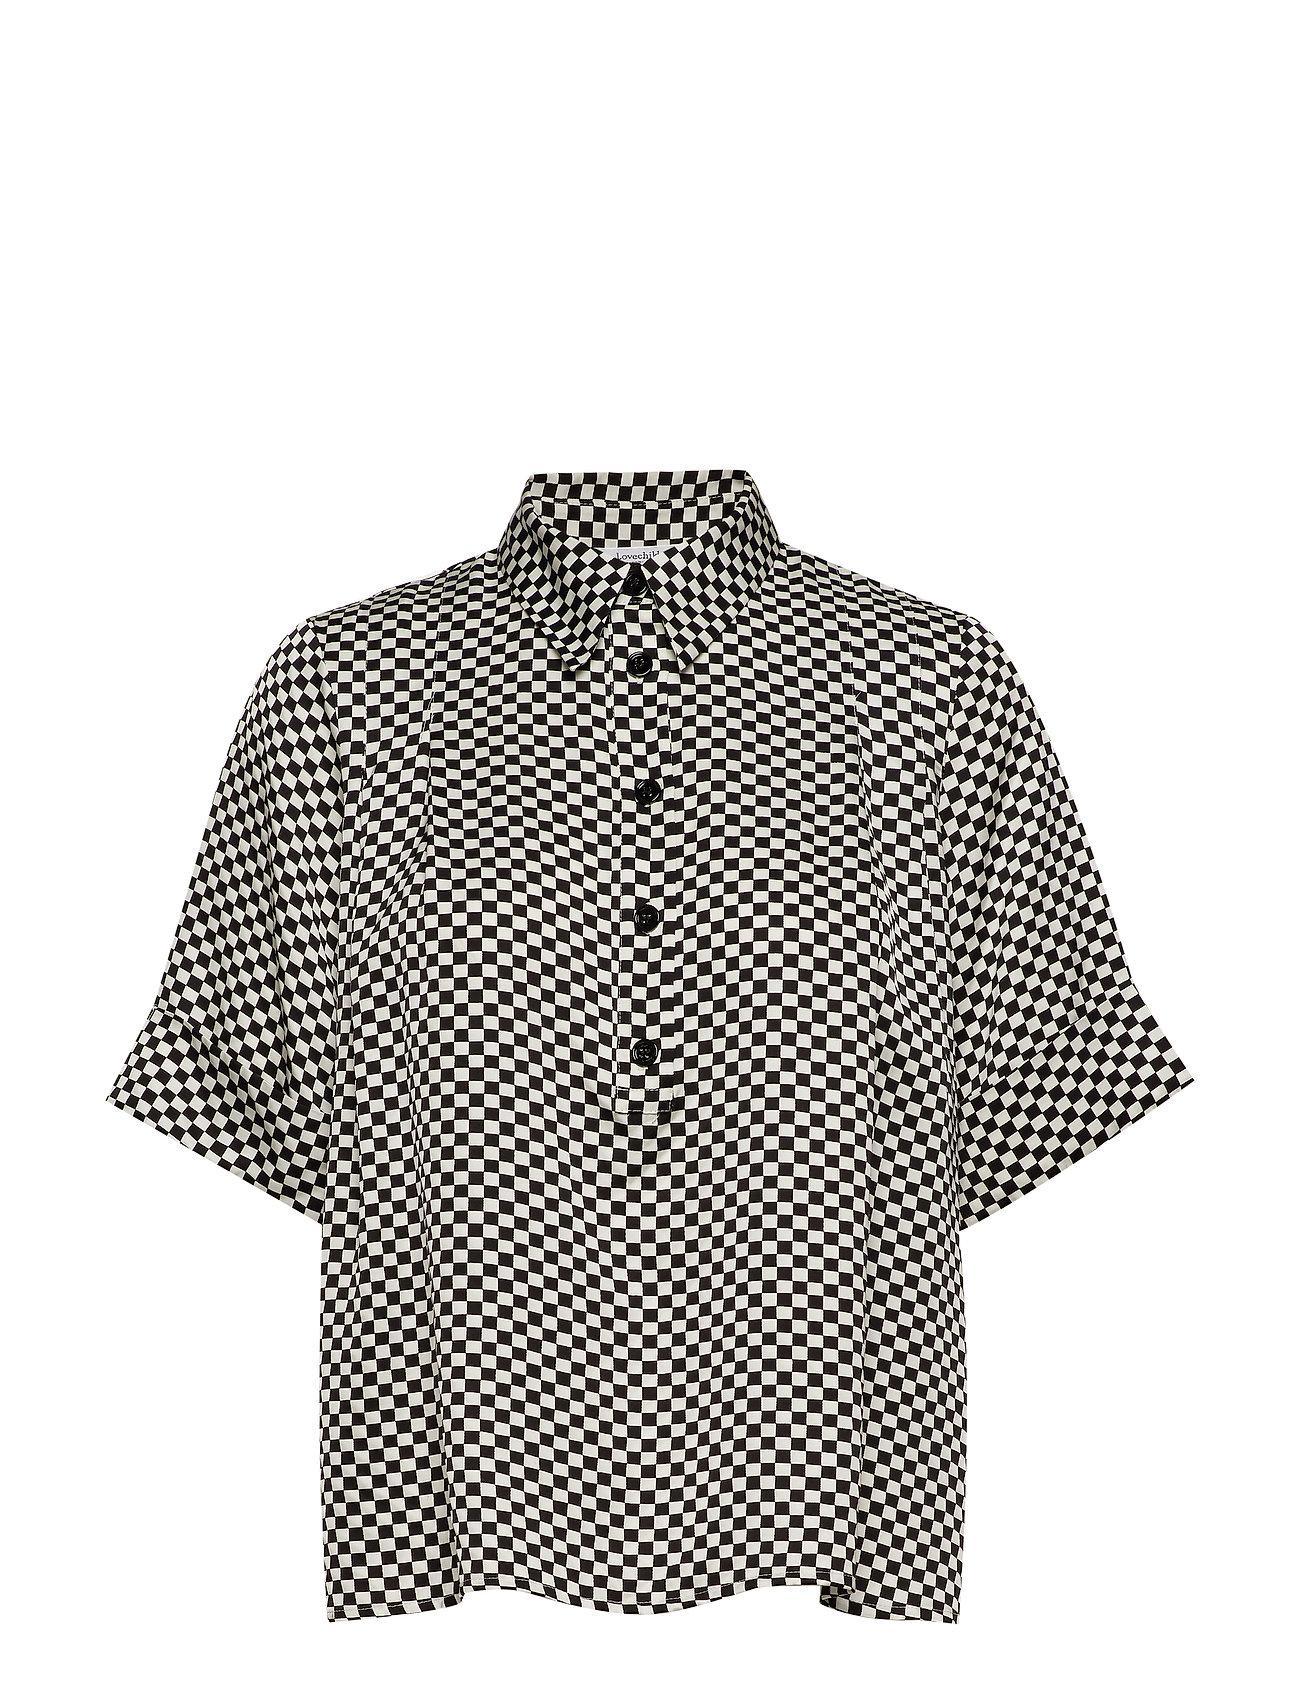 Lovechild 1979 Brooklyn Shirt - BLACK